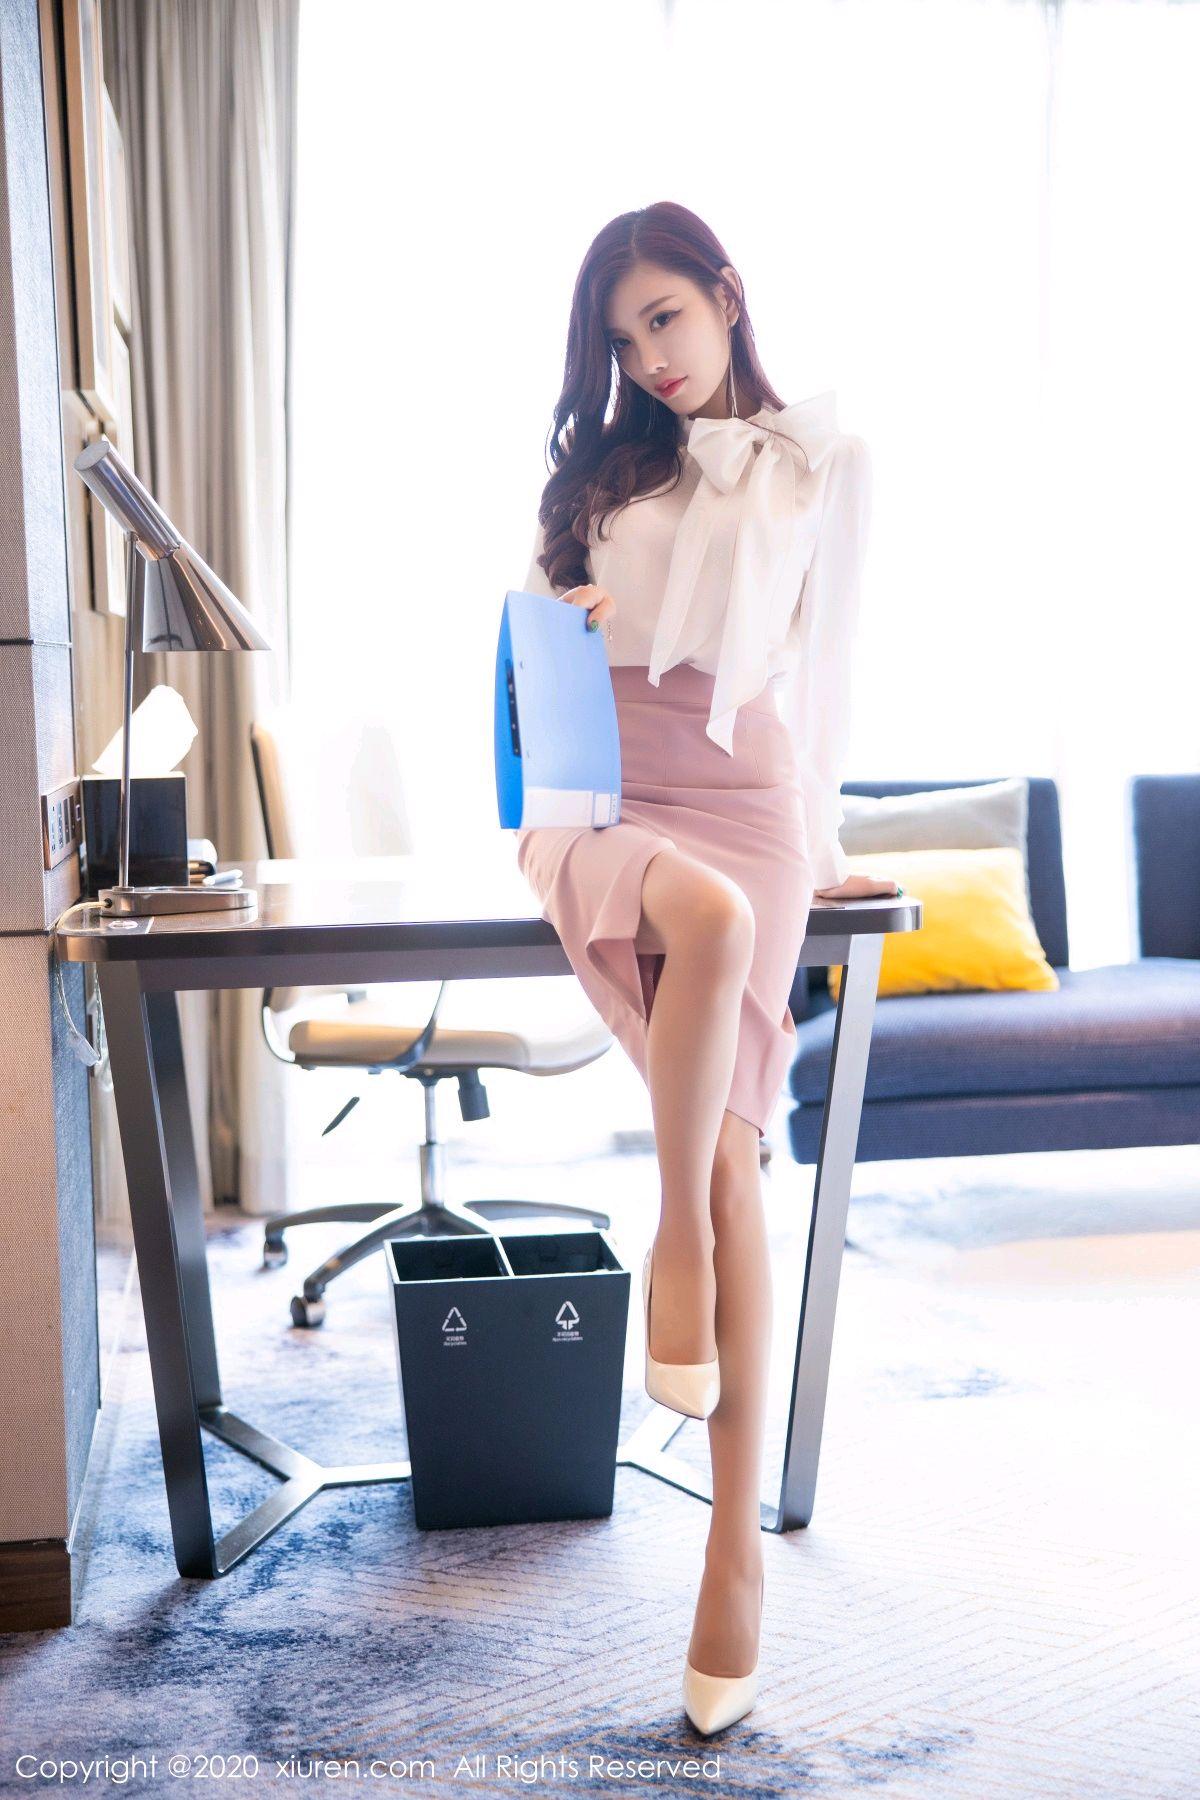 [XiuRen] Vol.2431 Yang Chen Chen 15P, Tall, Underwear, Uniform, Xiuren, Yang Chen Chen